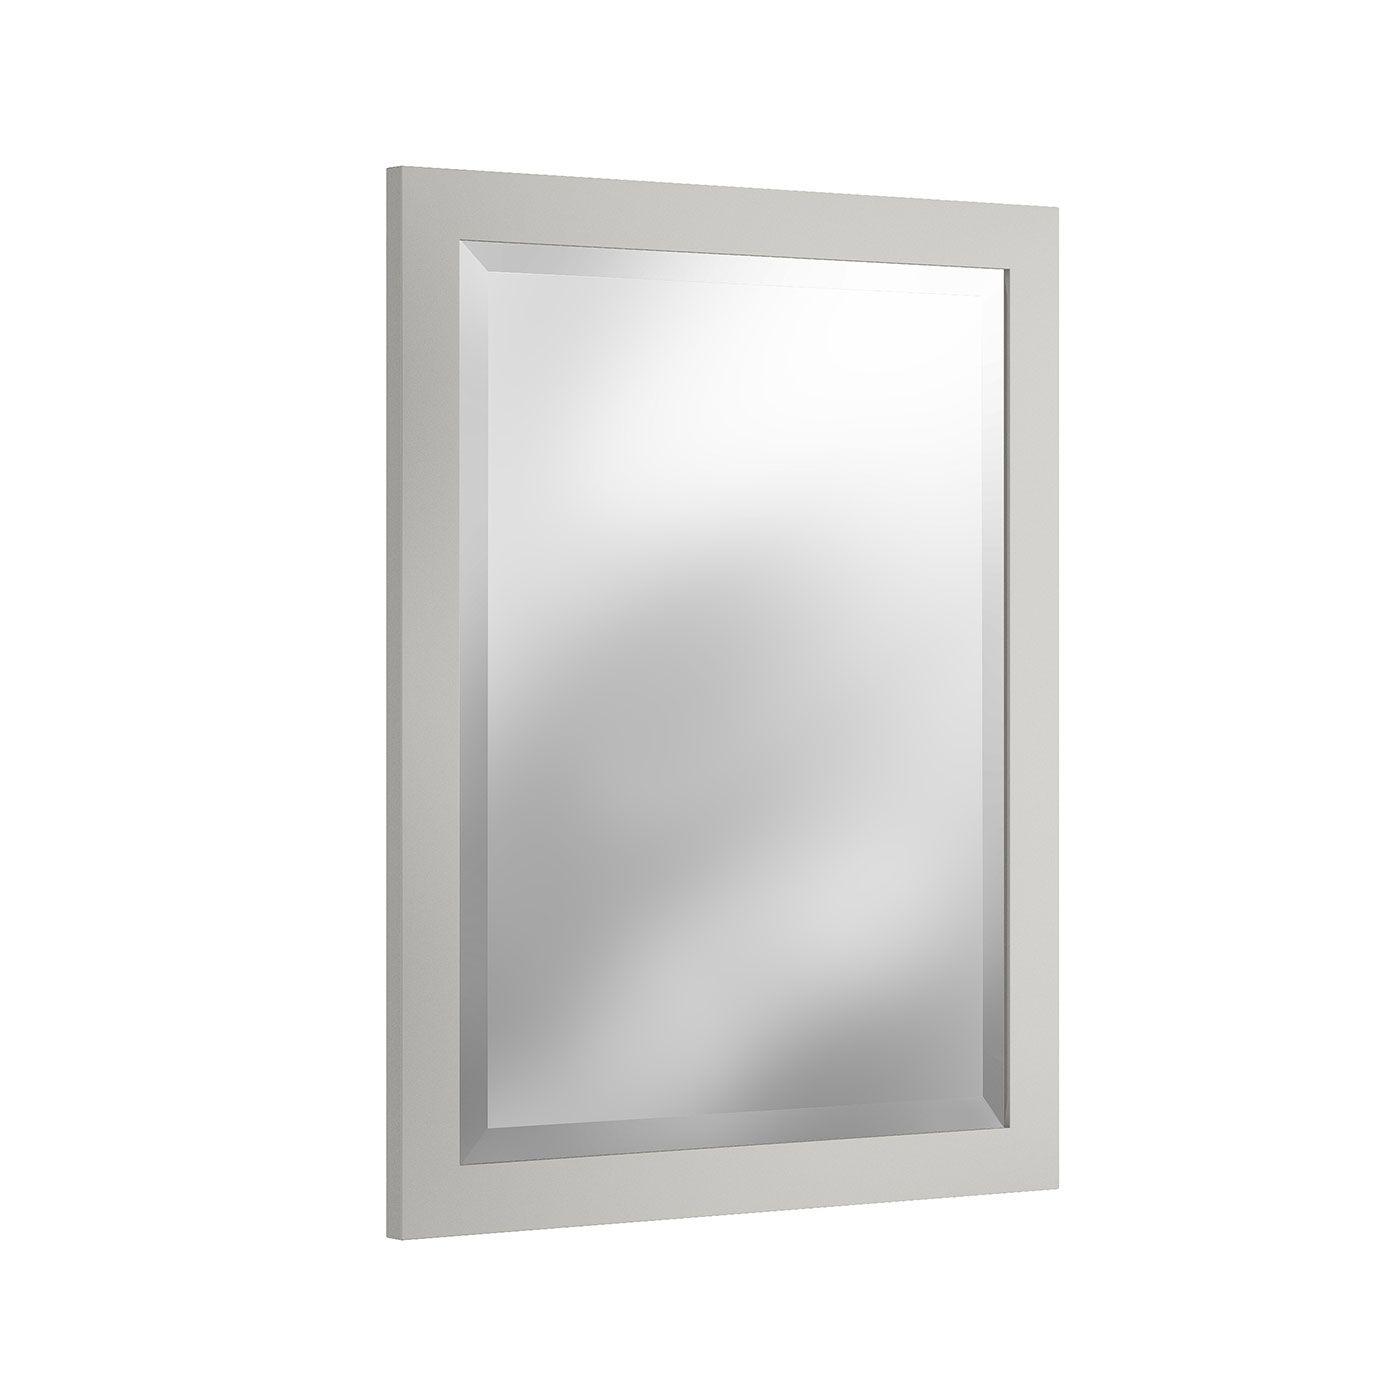 beveled bathroom vanity mirrors. The 25\ Beveled Bathroom Vanity Mirrors T